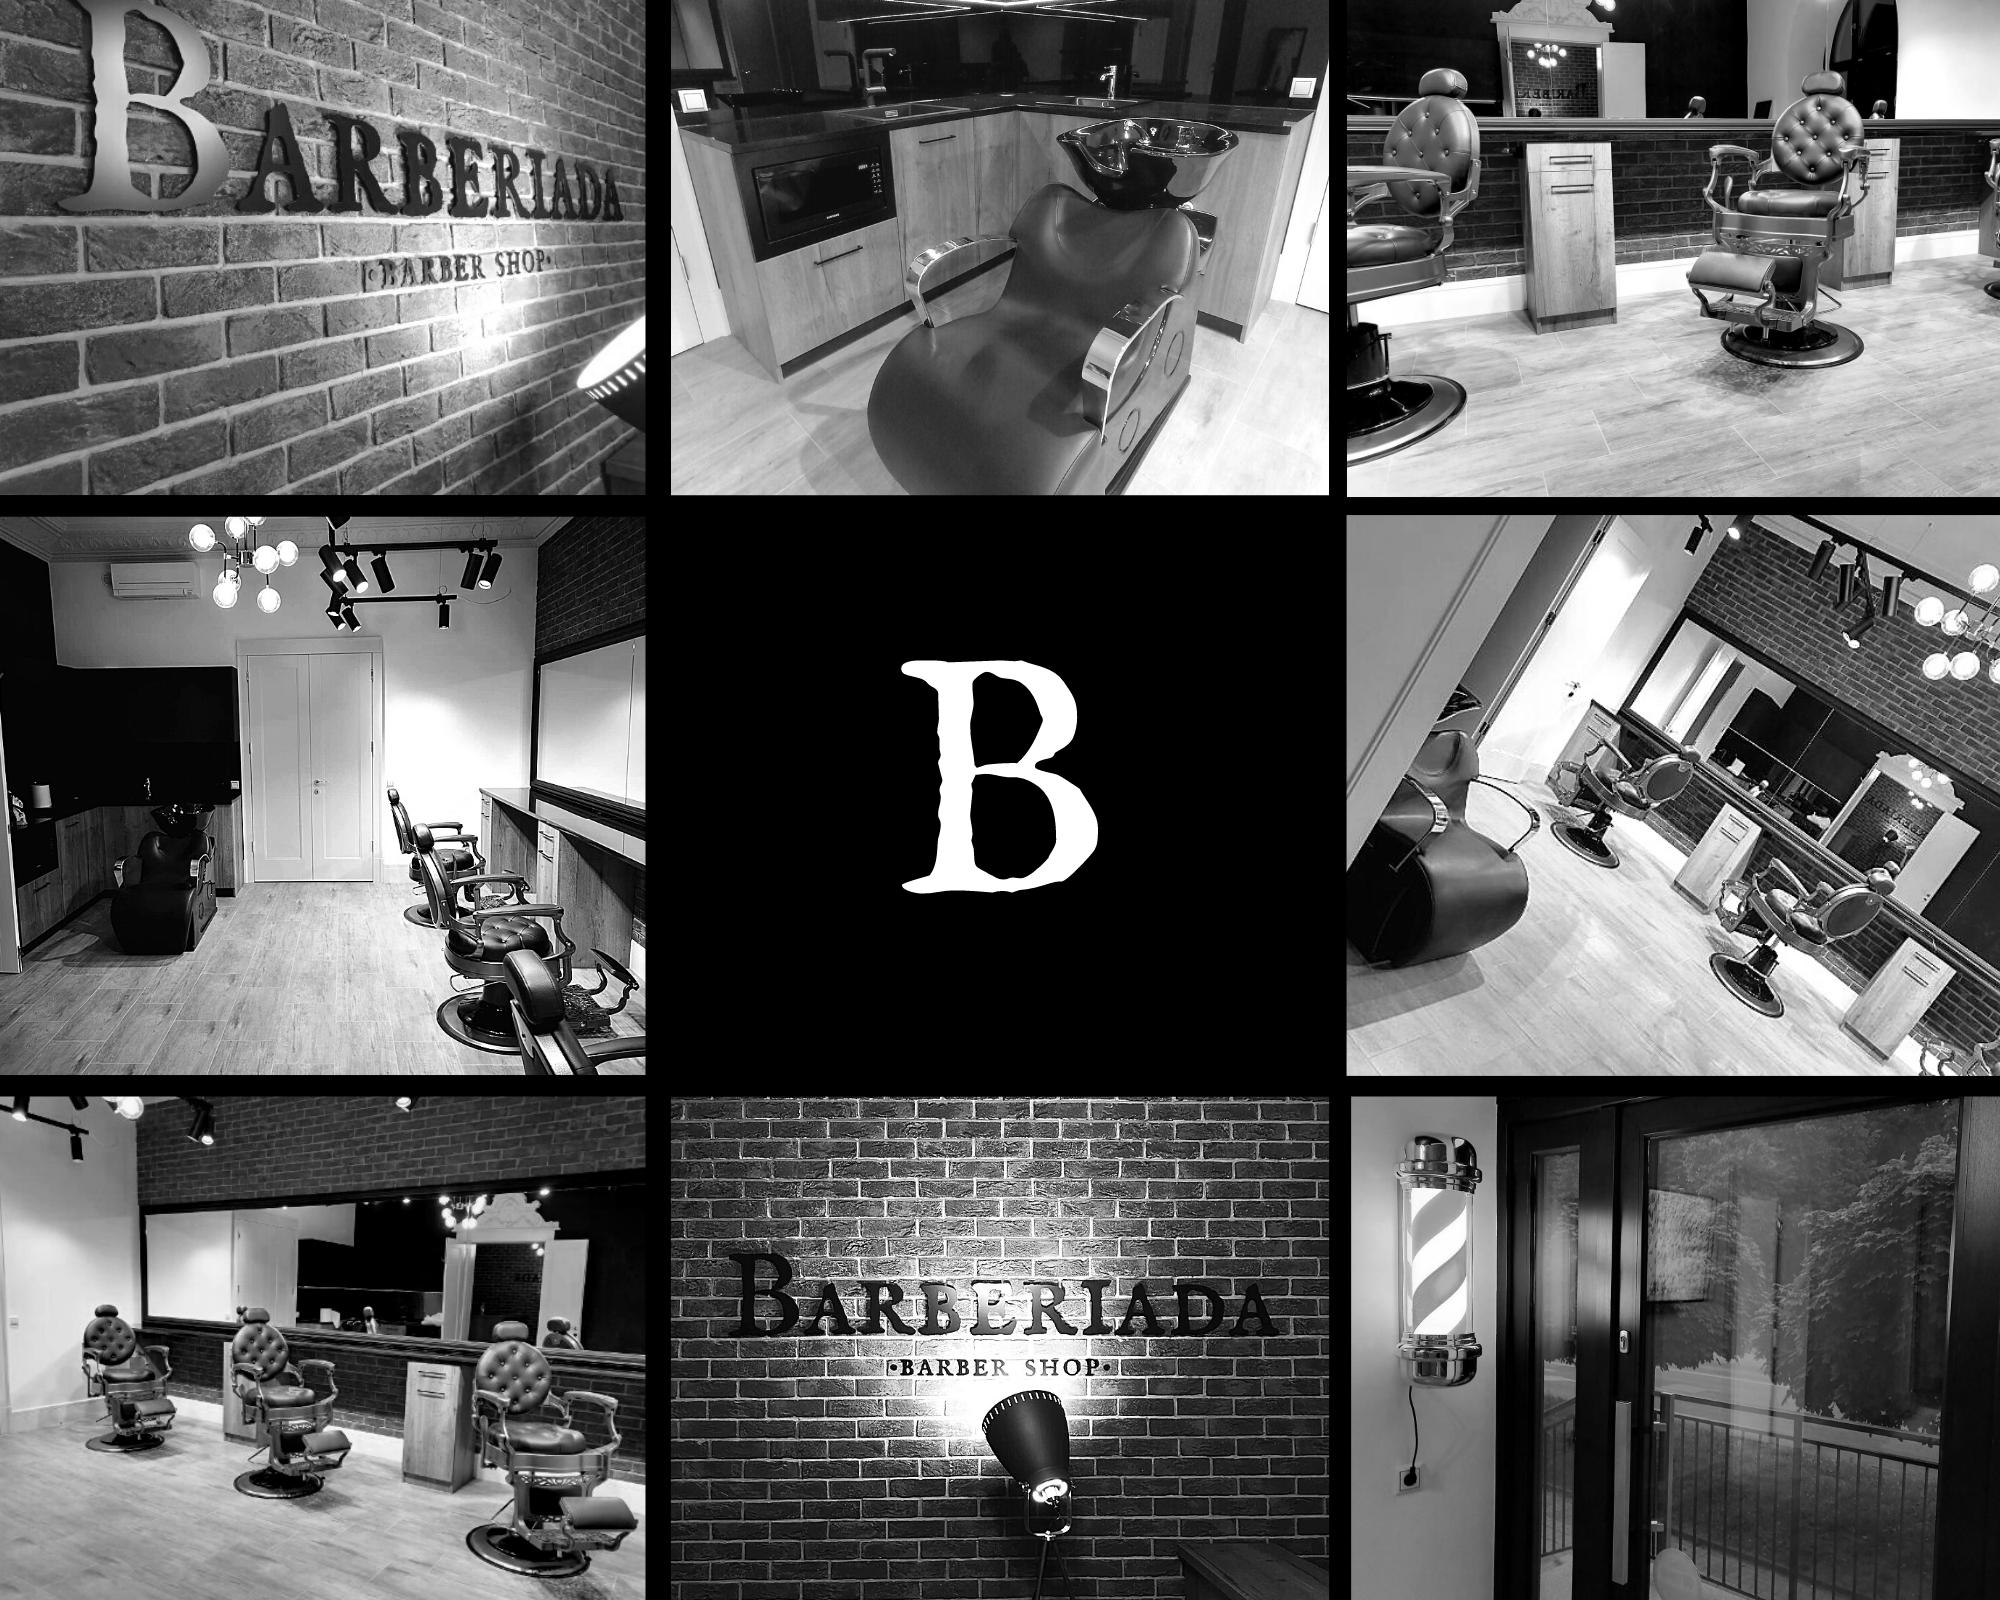 Salon Barberiada Barber Shop